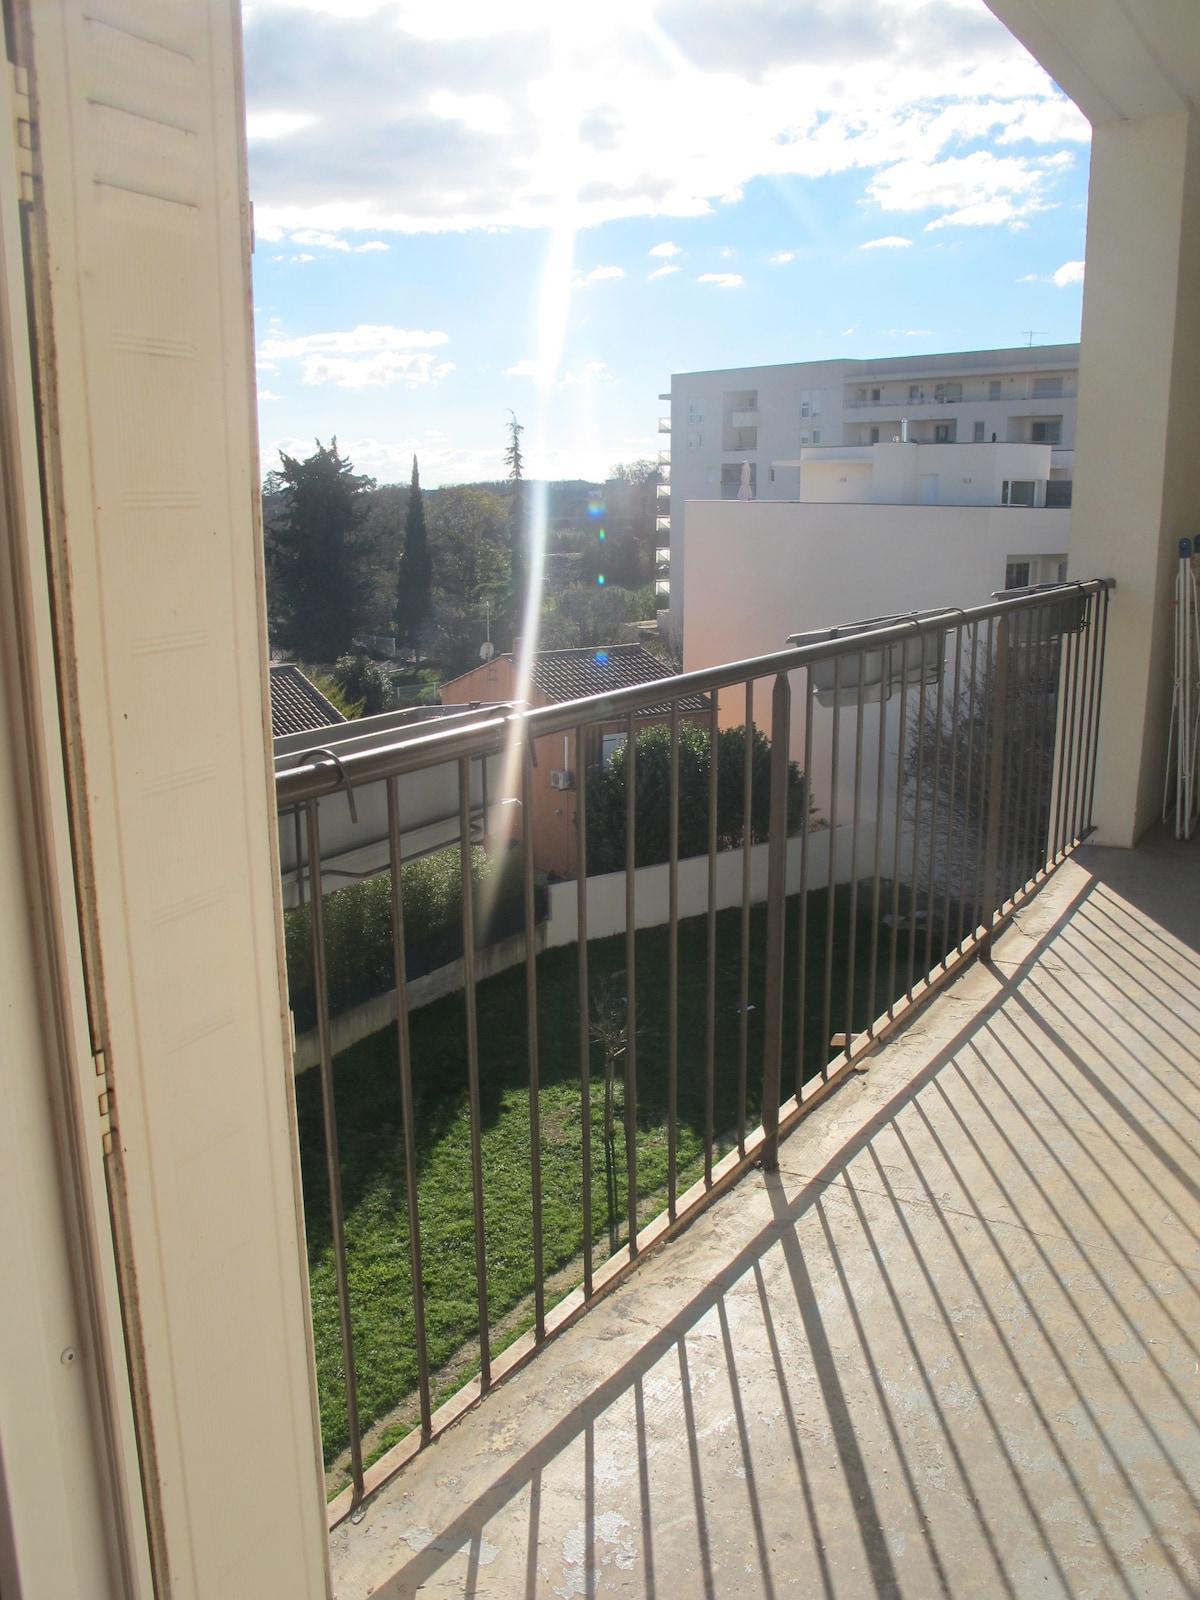 Nice morning light on the balcony.